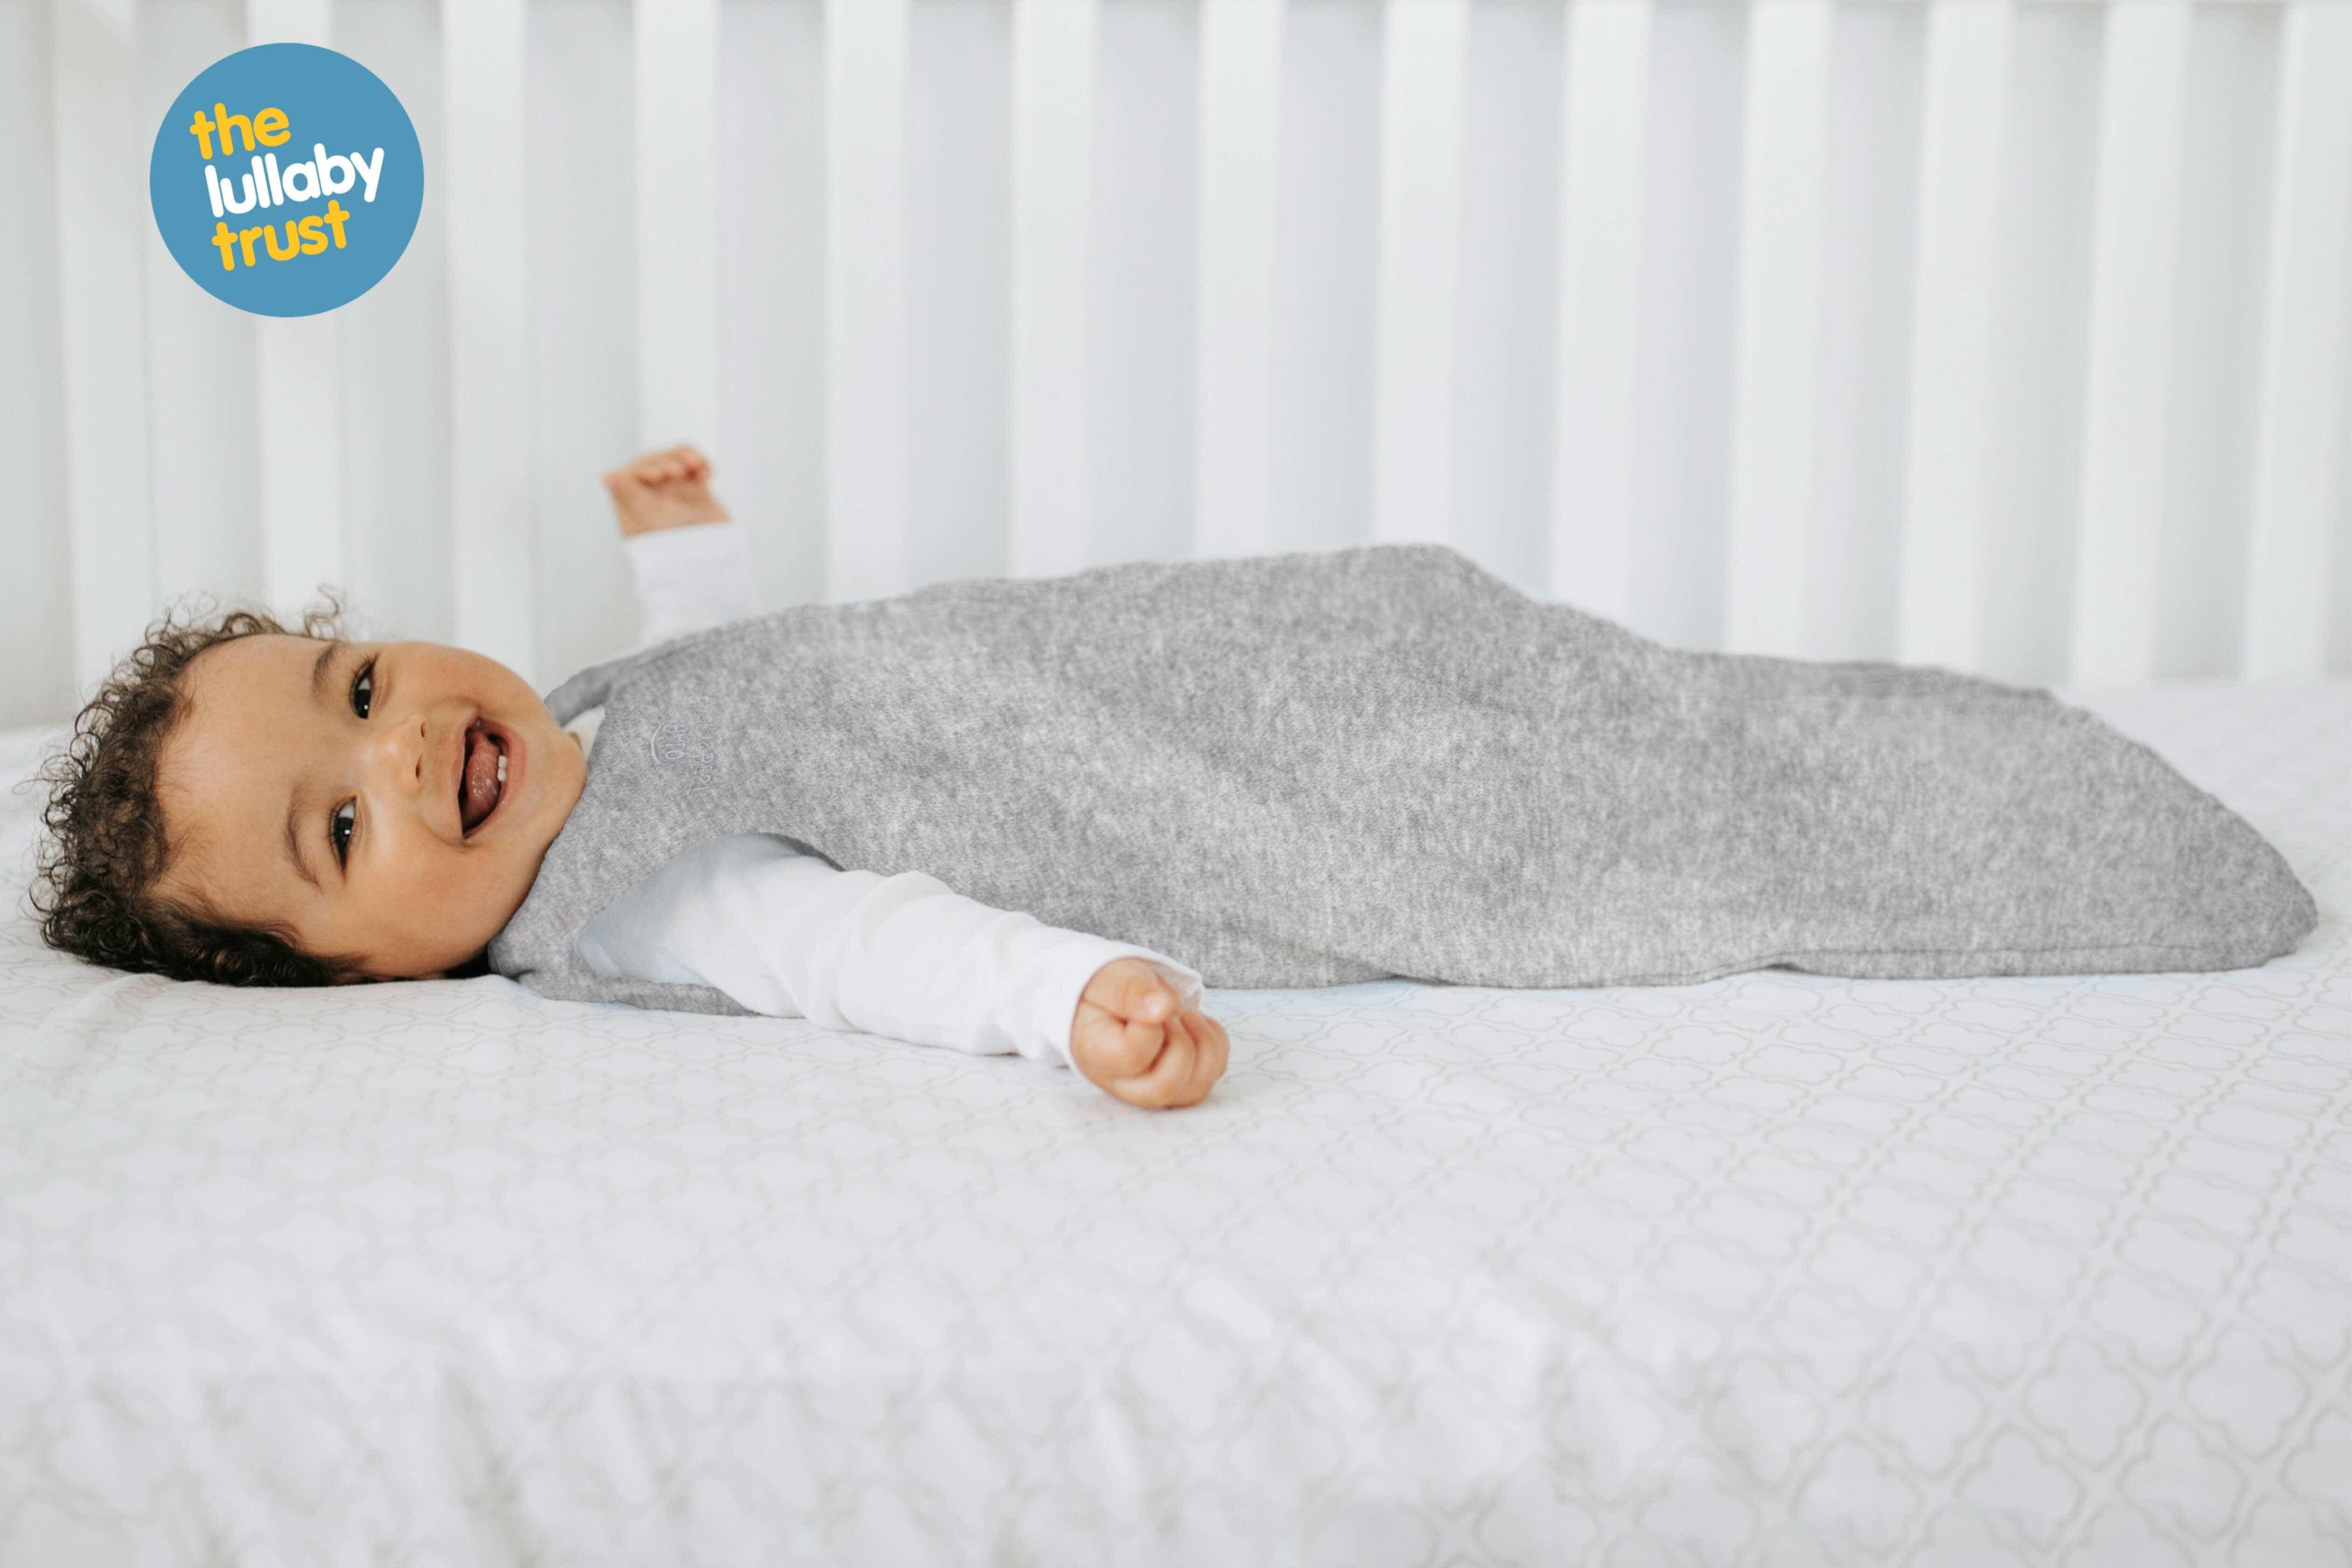 Baby smiling while wearing HALO SleepSack sleeping bag 0.5 TOG Heather Grey